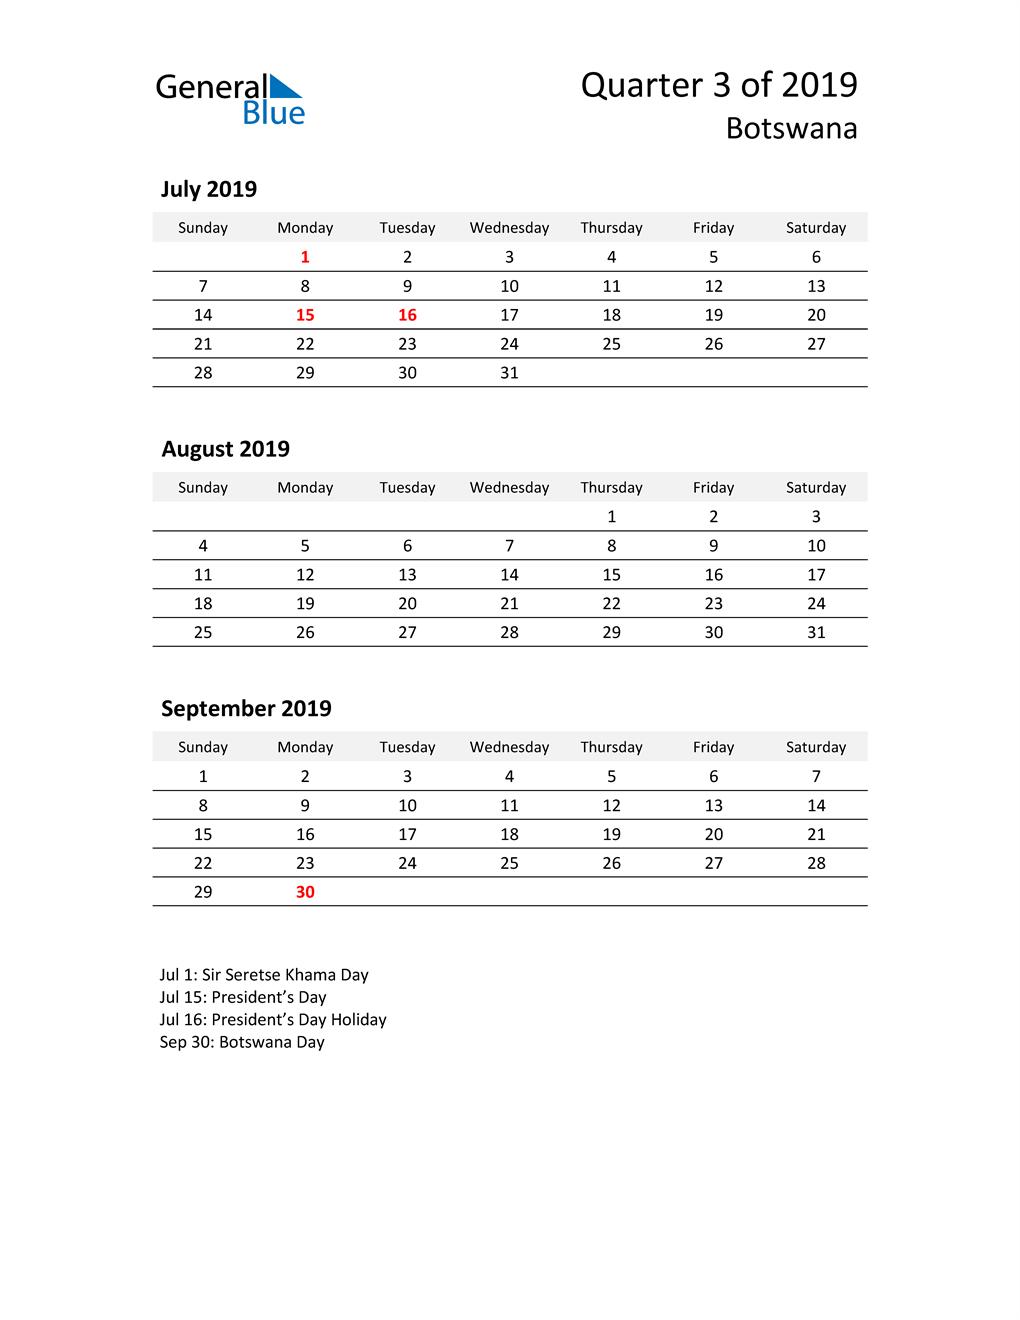 2019 Three-Month Calendar for Botswana